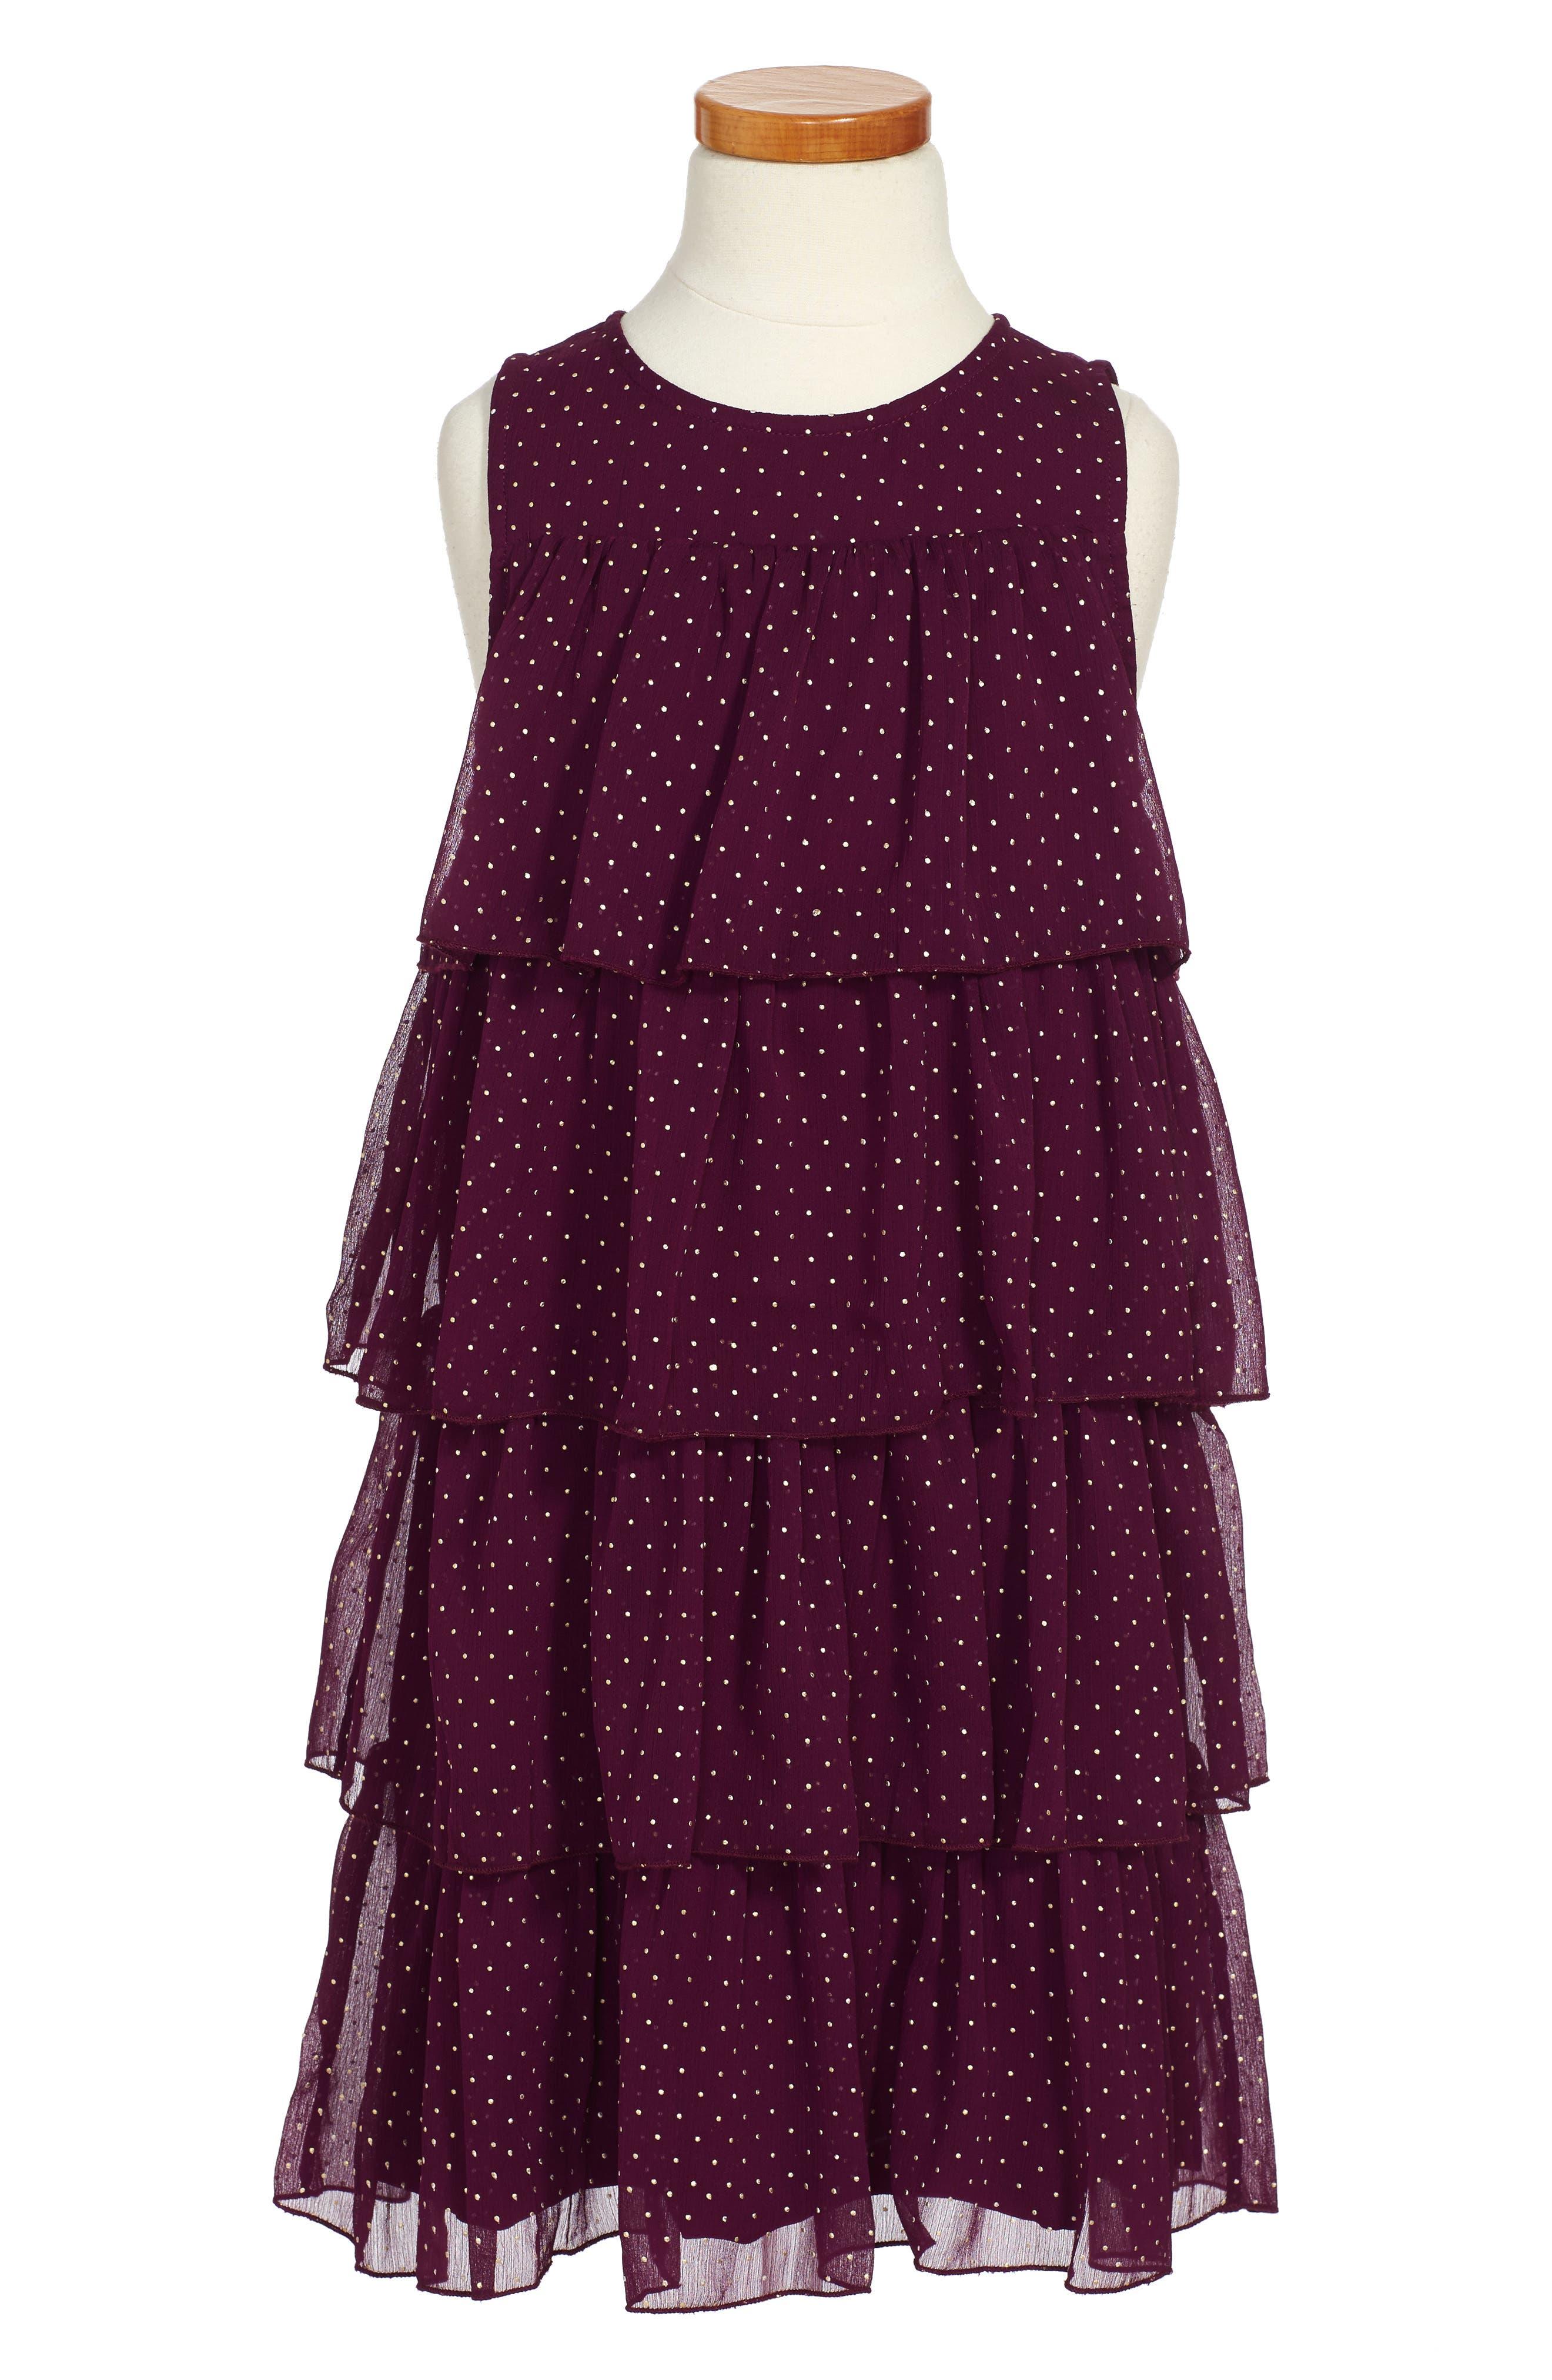 Alternate Image 1 Selected - Ruby & Bloom Tiered Dot Dress (Toddler Girls, Little Girls & Big Girls)